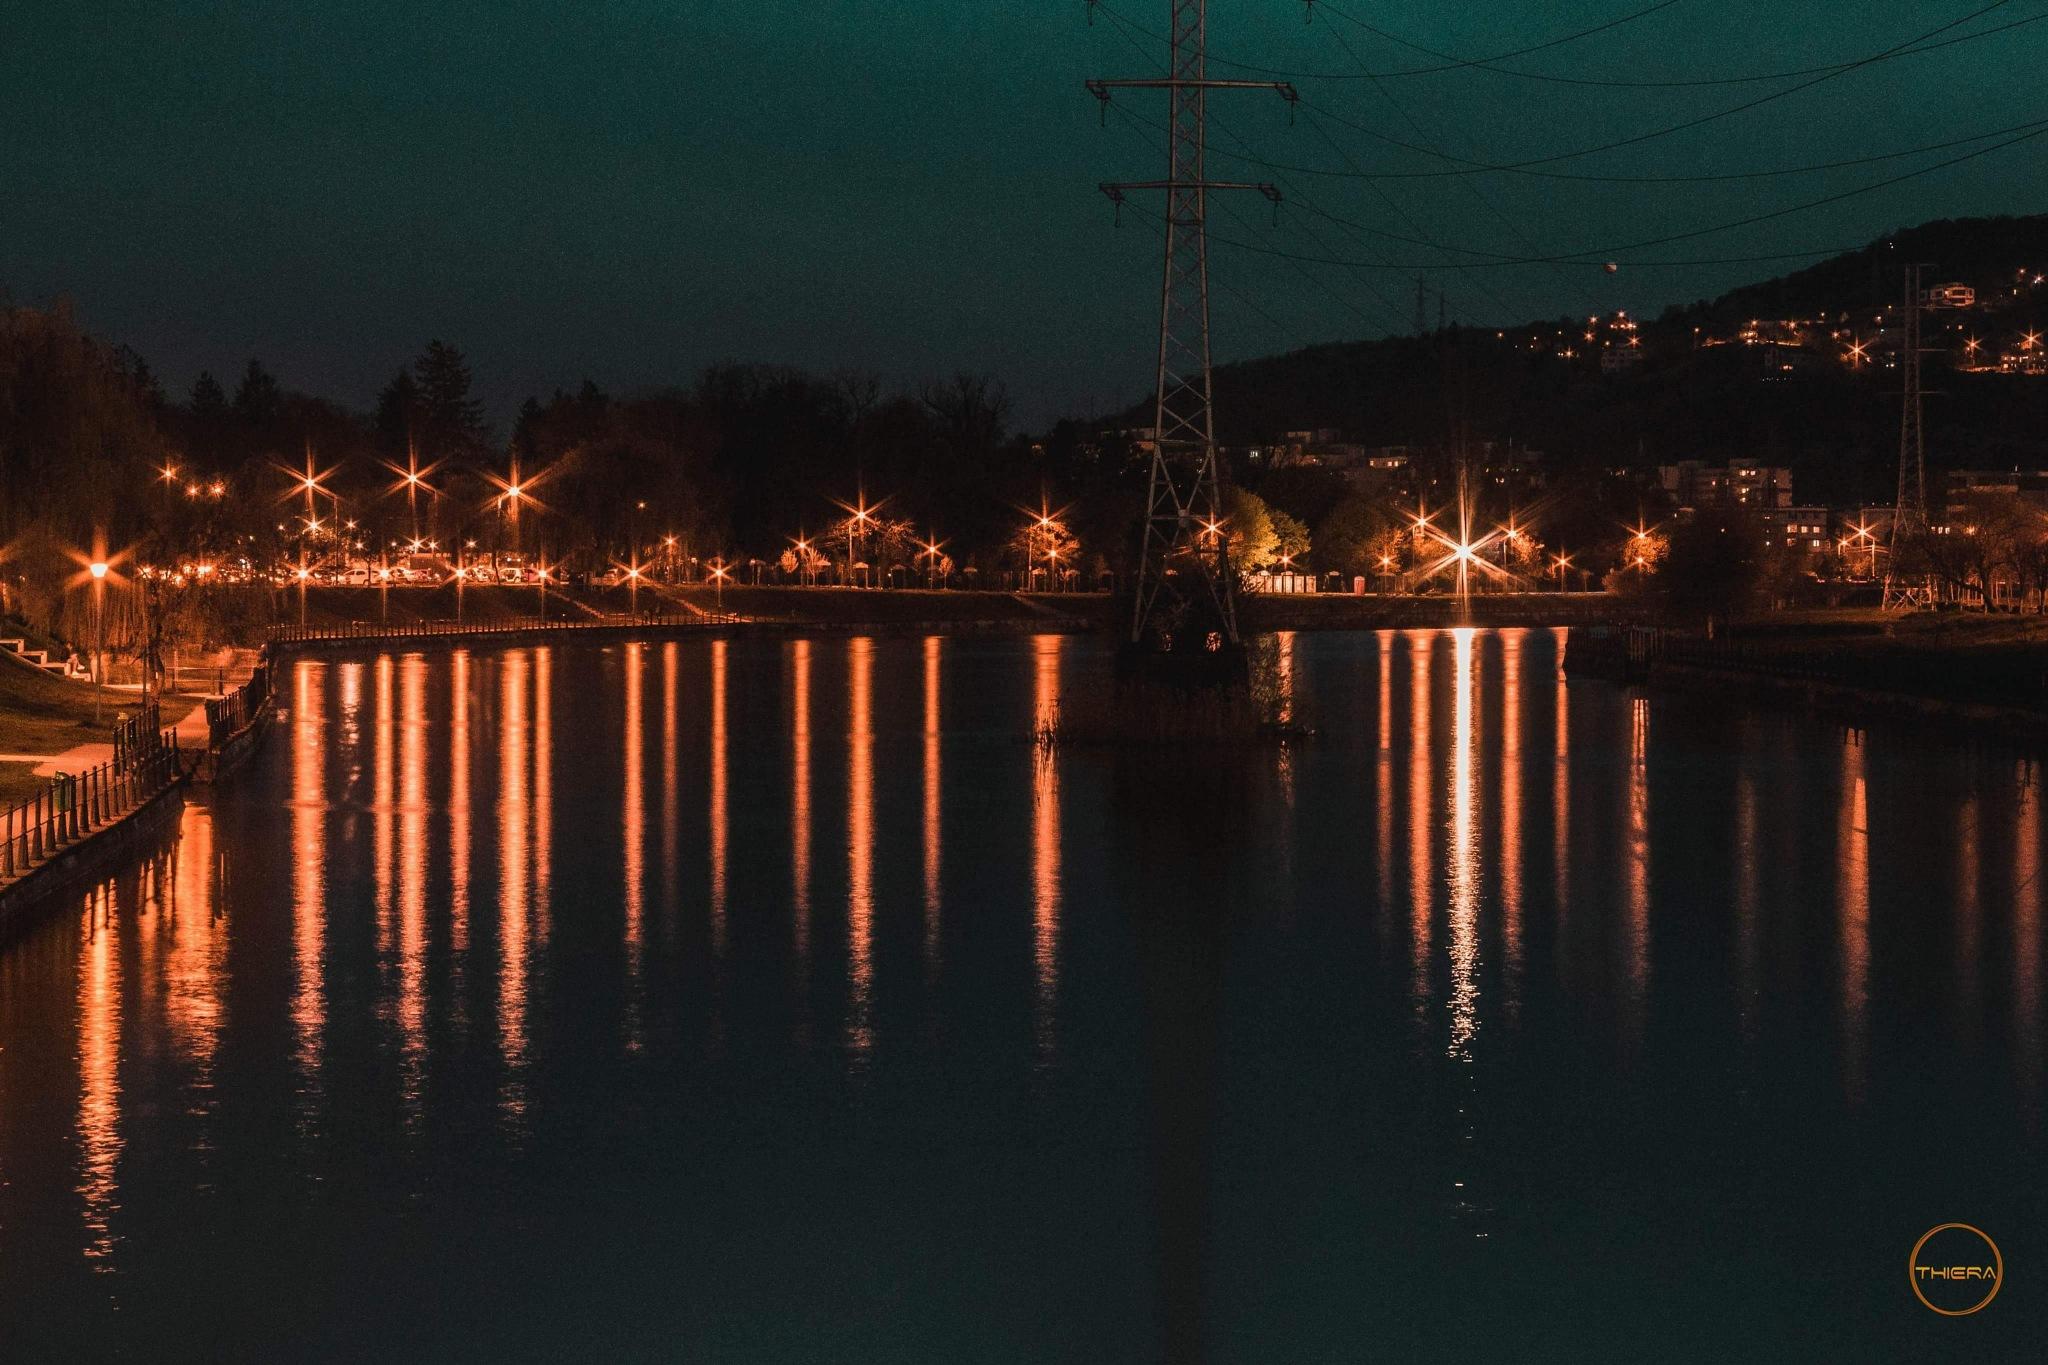 City lights. by Tunyogi I. György